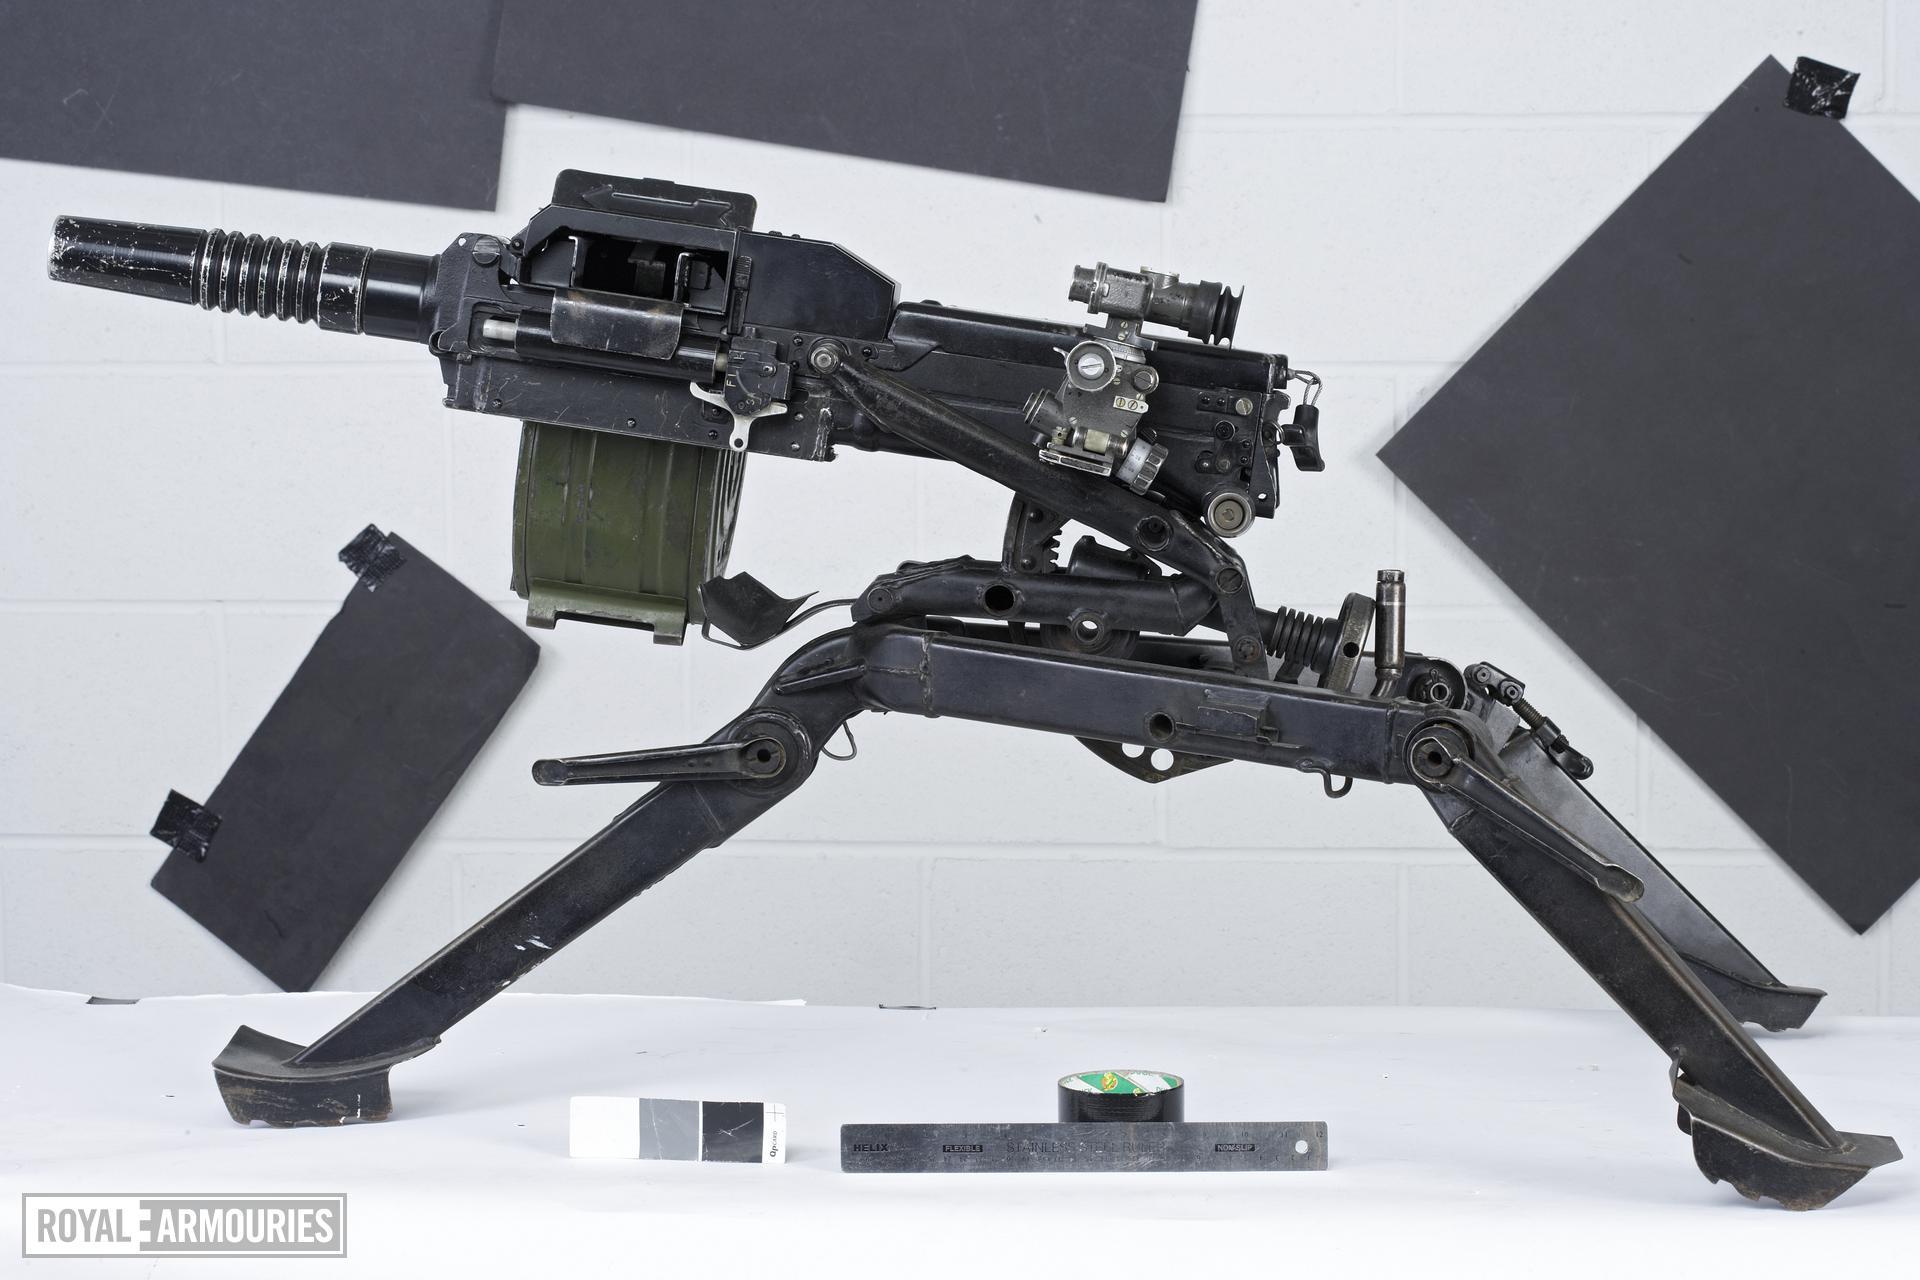 Centrefire automatic grenade launcher - AGS17